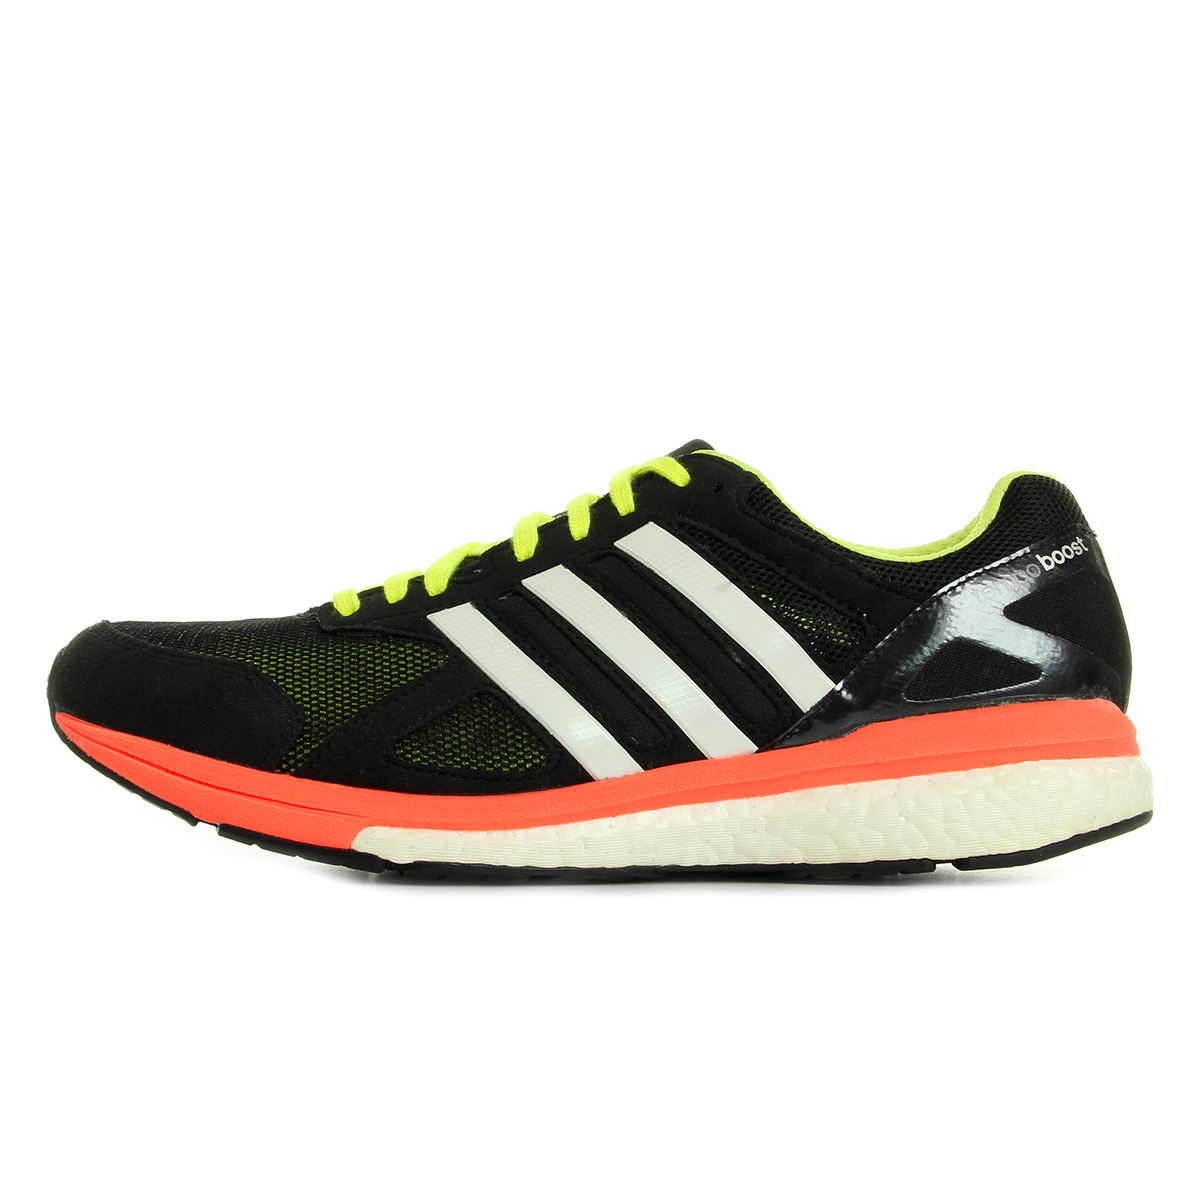 adidas Performance Chaussures de Running Adizero Tempo 7 W - Noir - Schwarz, 38 EU